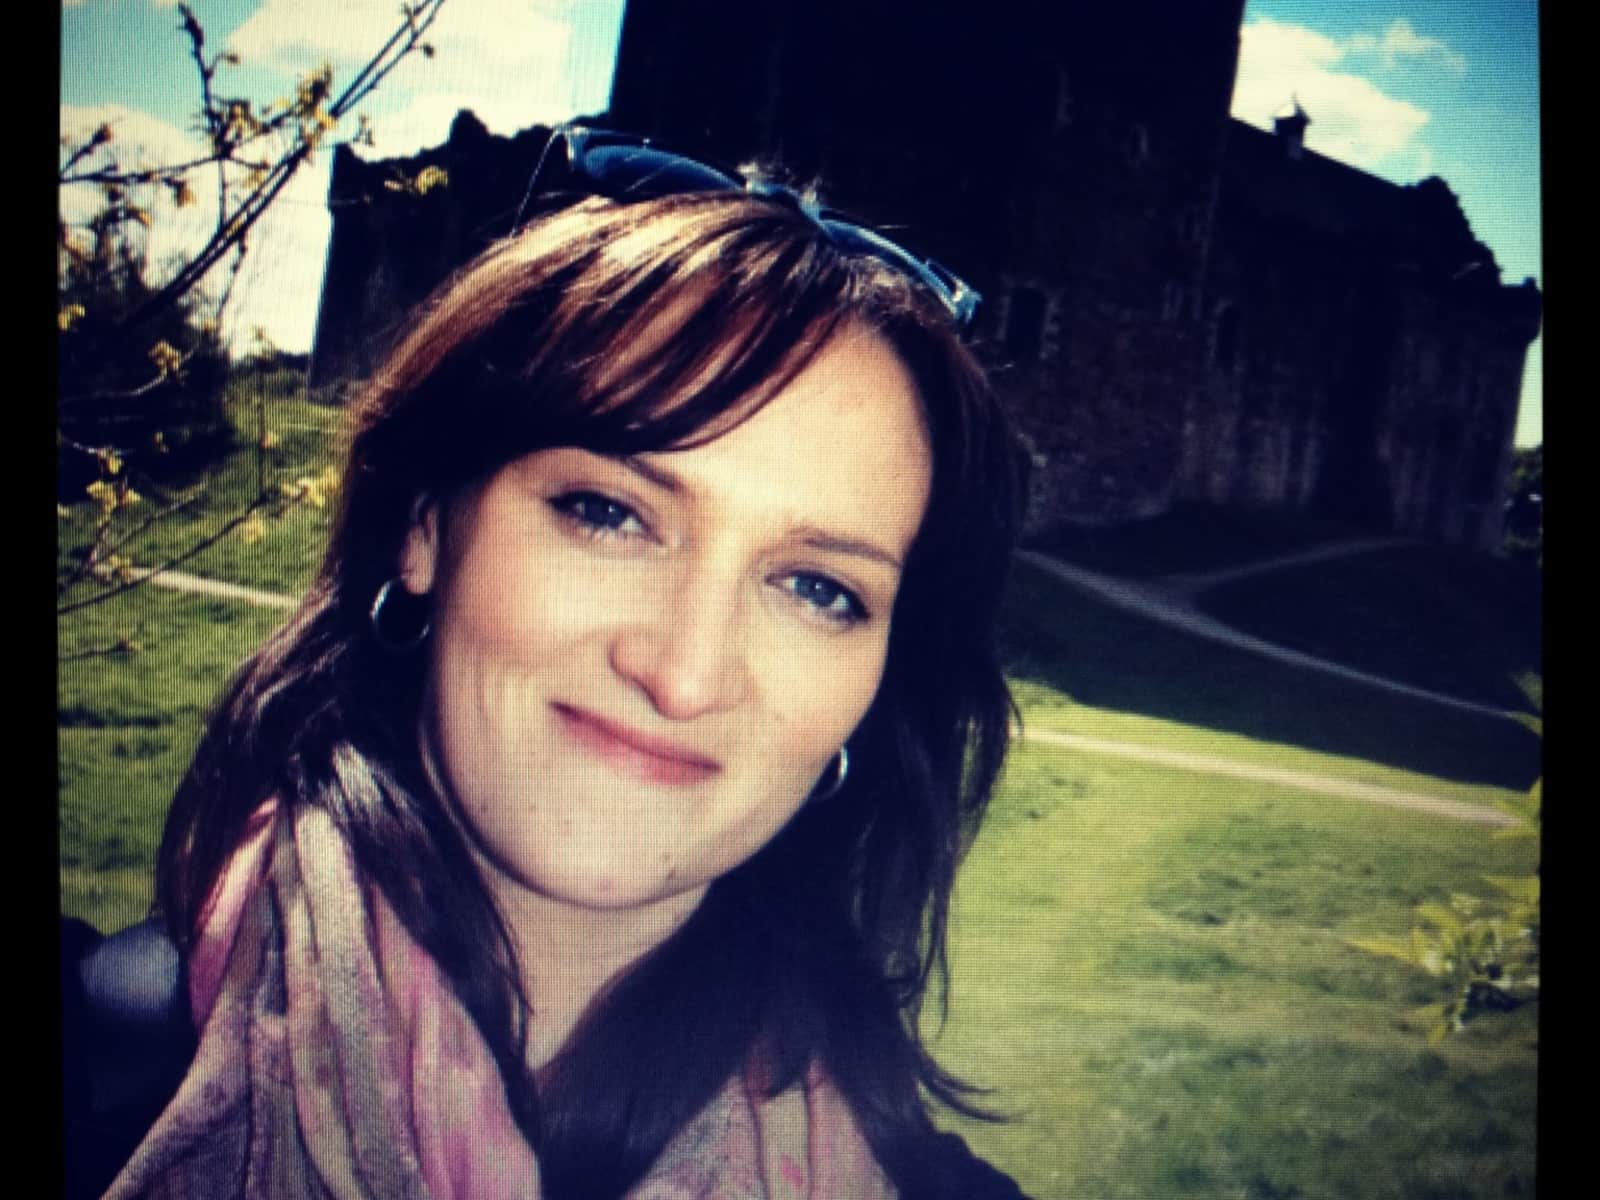 Kellie from Melbourne, Victoria, Australia